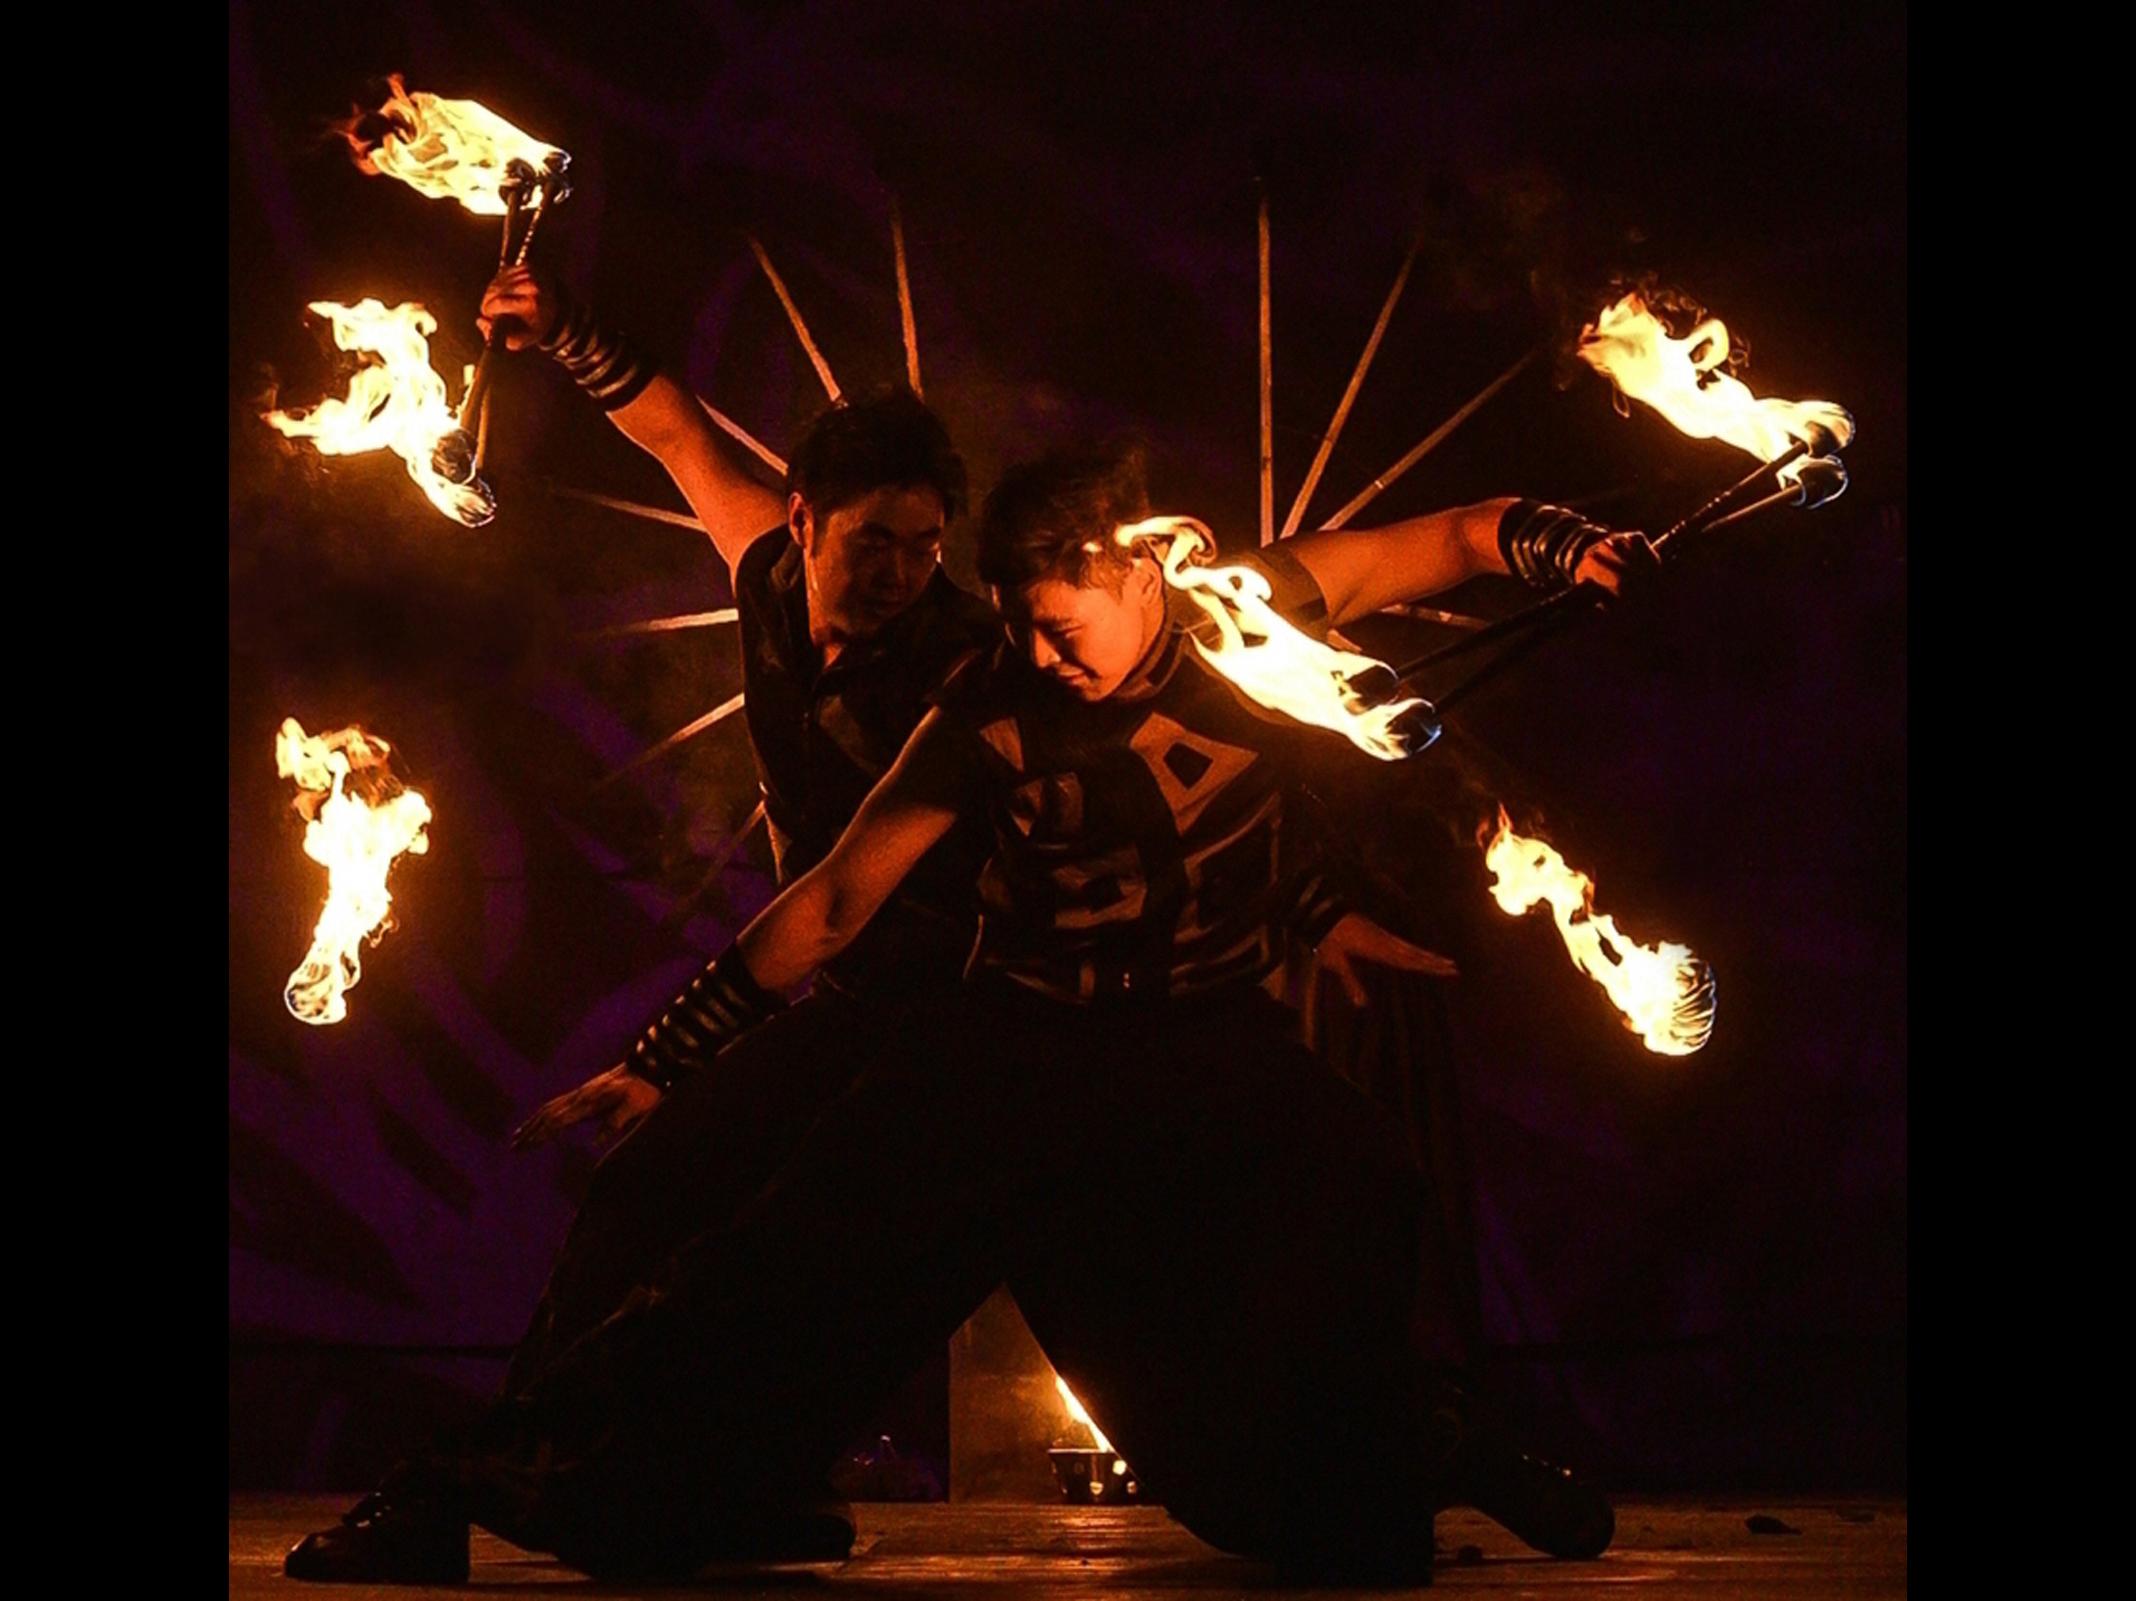 Fire Arts_Flaming Fire team_hunyflow (4)